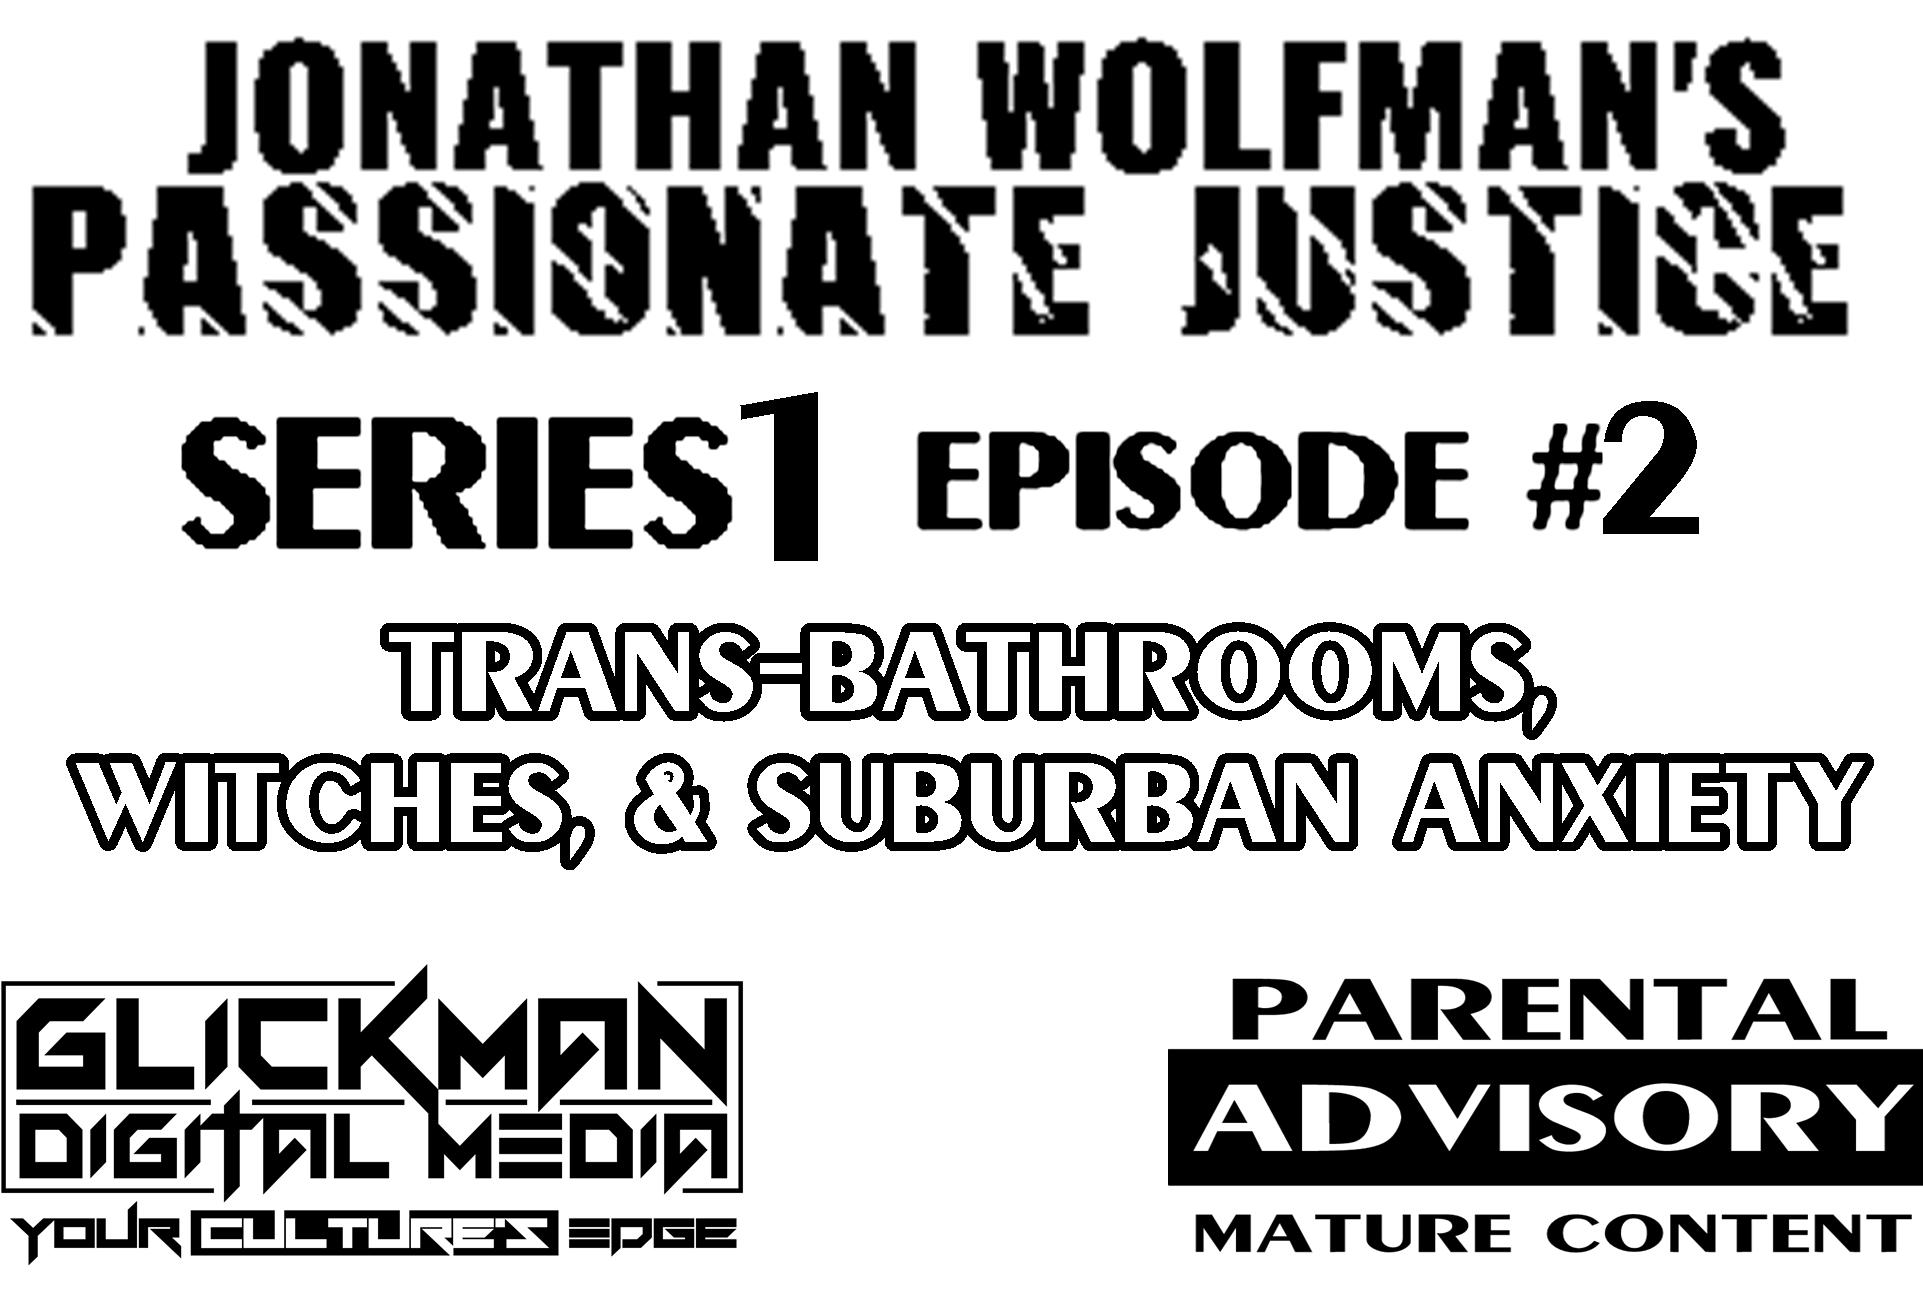 PJ  GDM POSTER 2  TRANS-BATHROOMS white.png